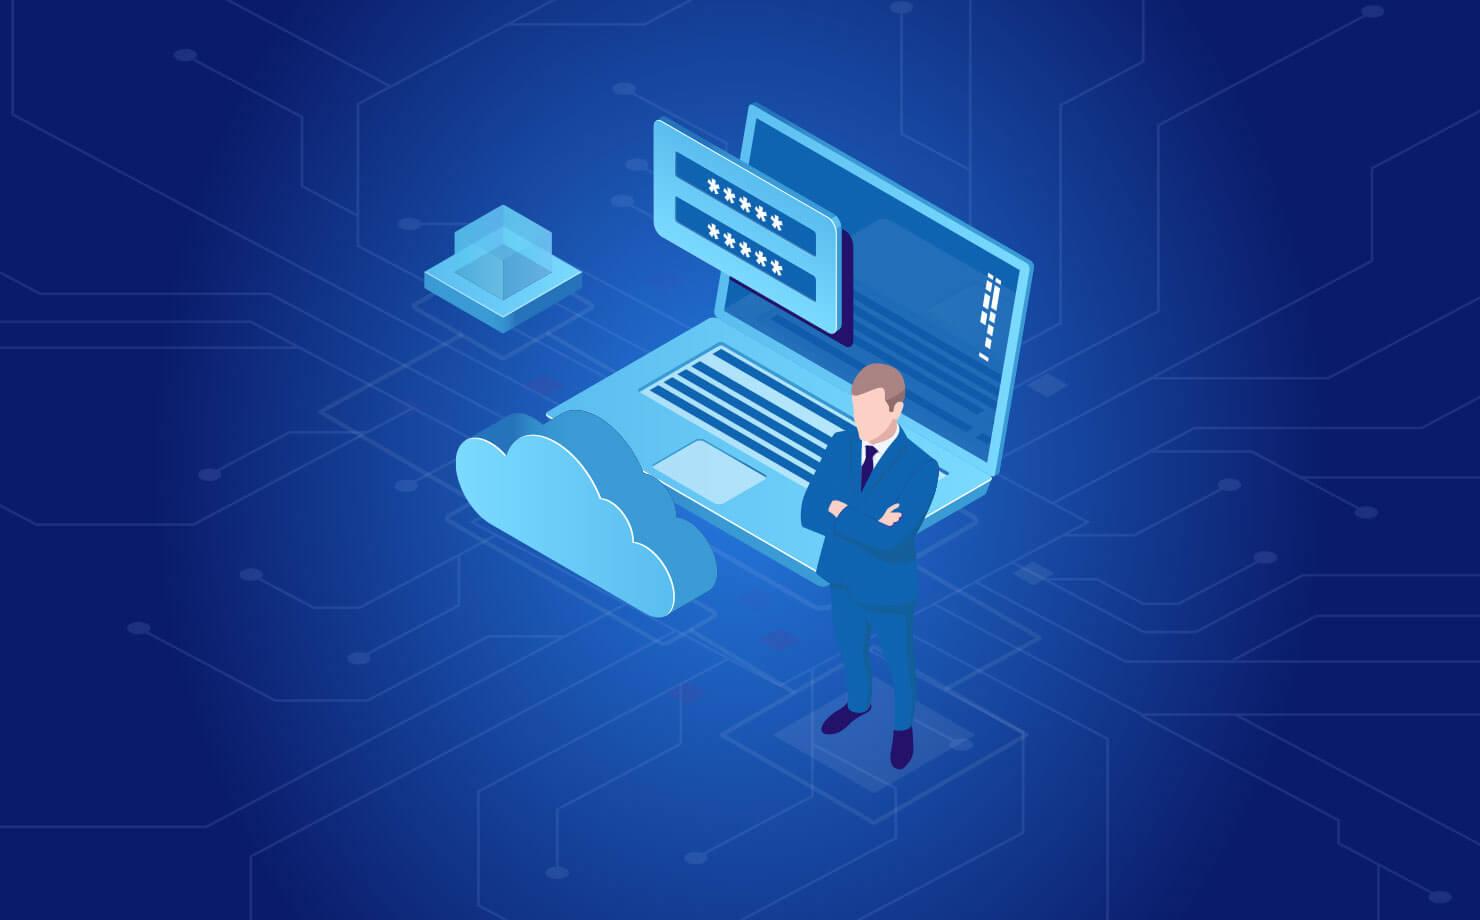 B2B software security